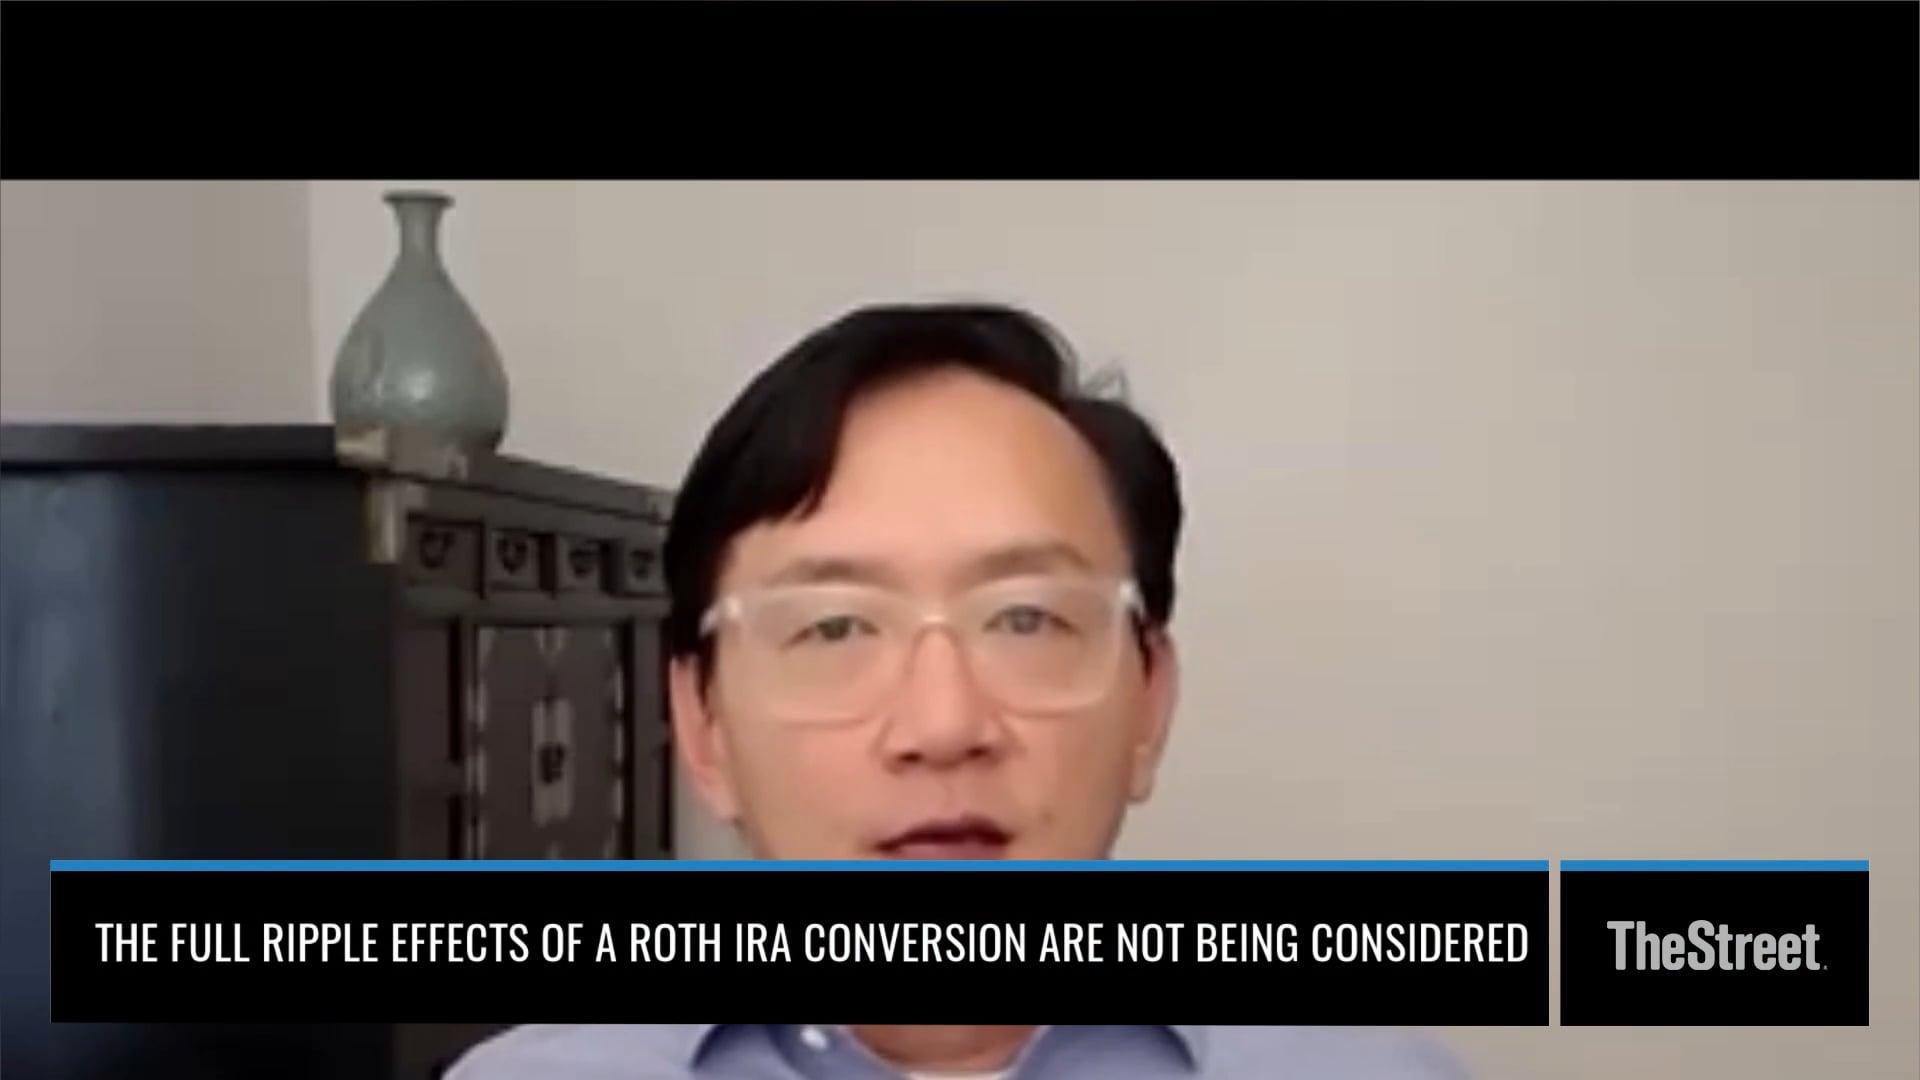 Roth IRA Conversions